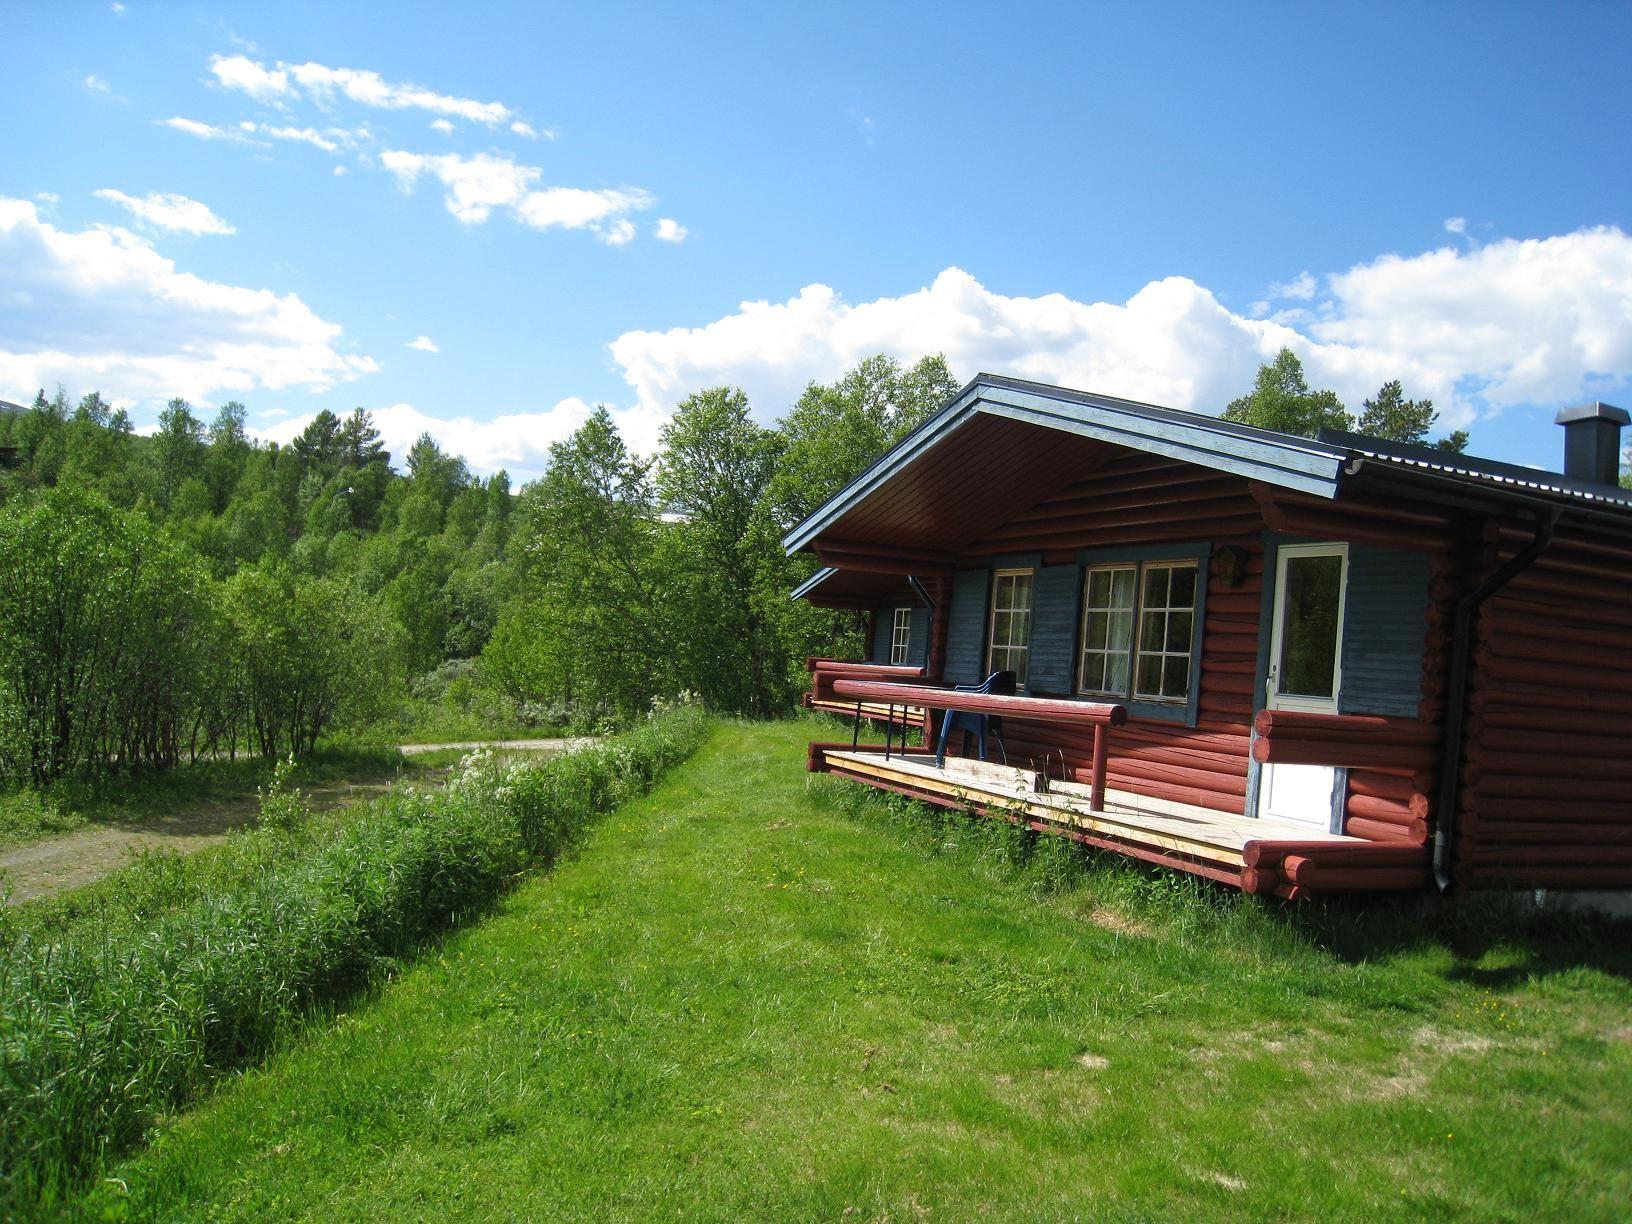 Bruksvallsliden Stugby resort village